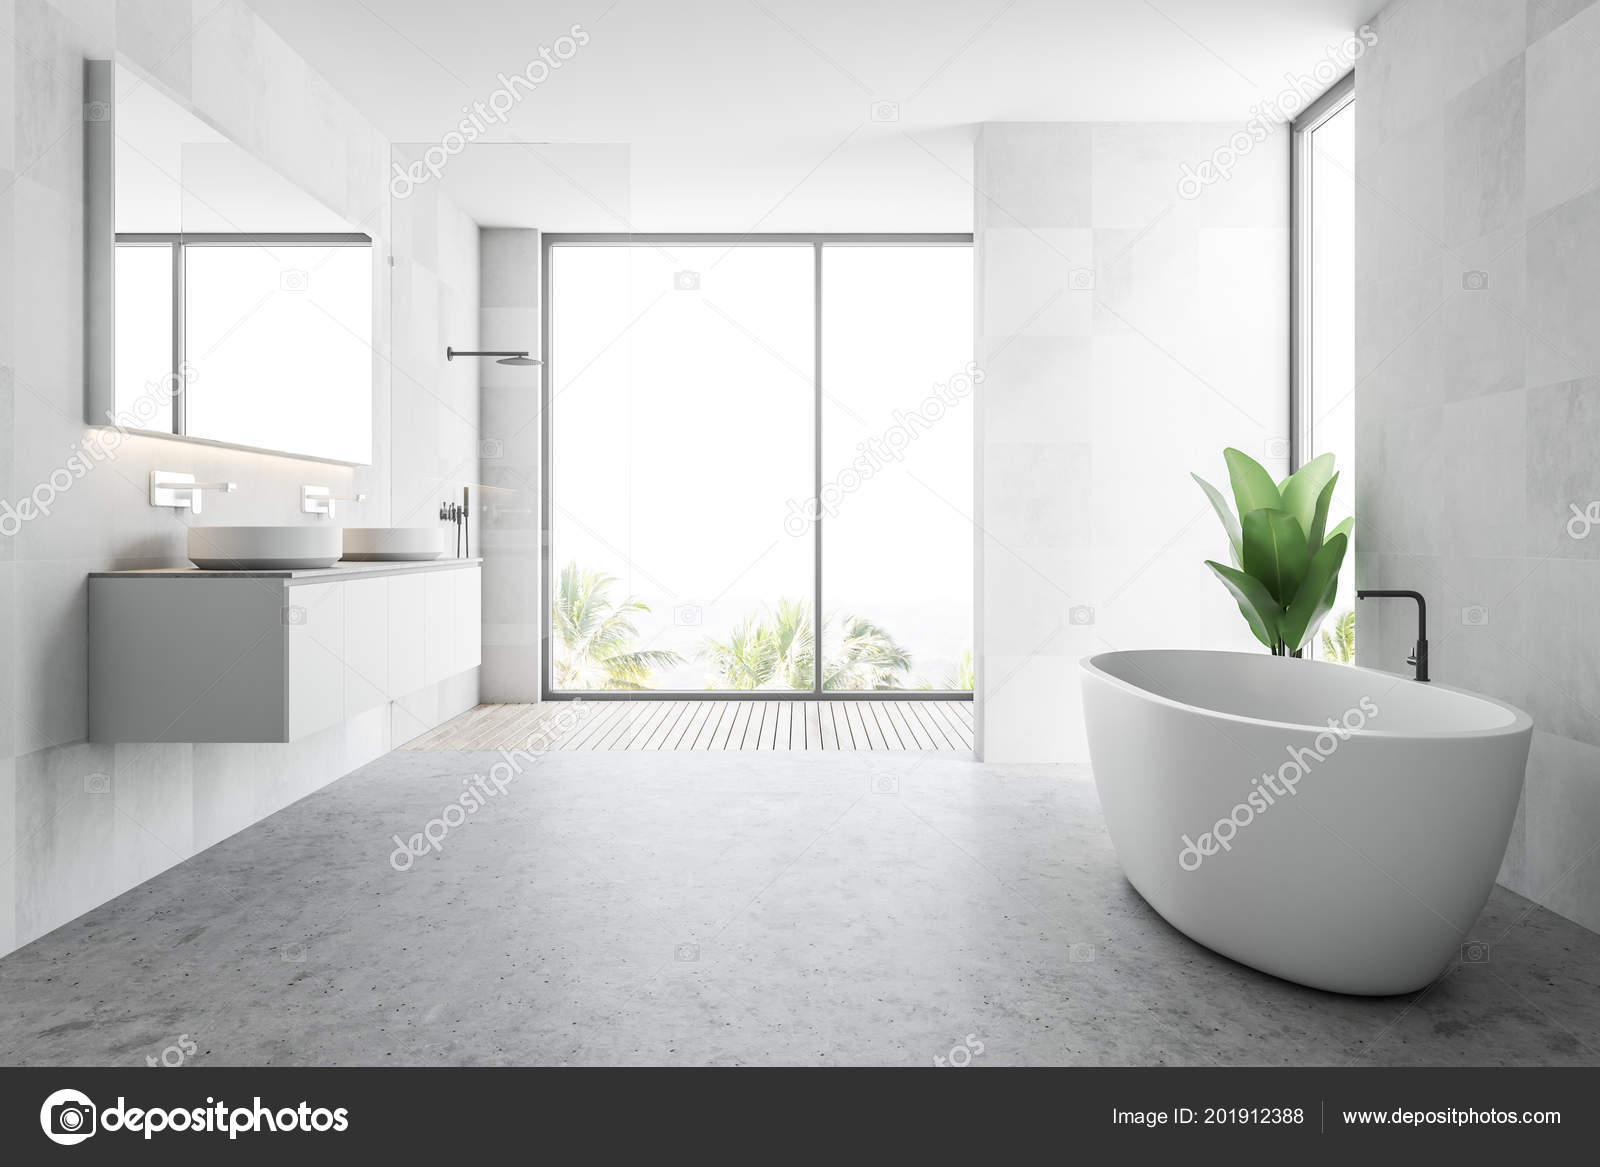 White Wooden Tile Bathroom Interior Concrete Floor White Bathtub ...